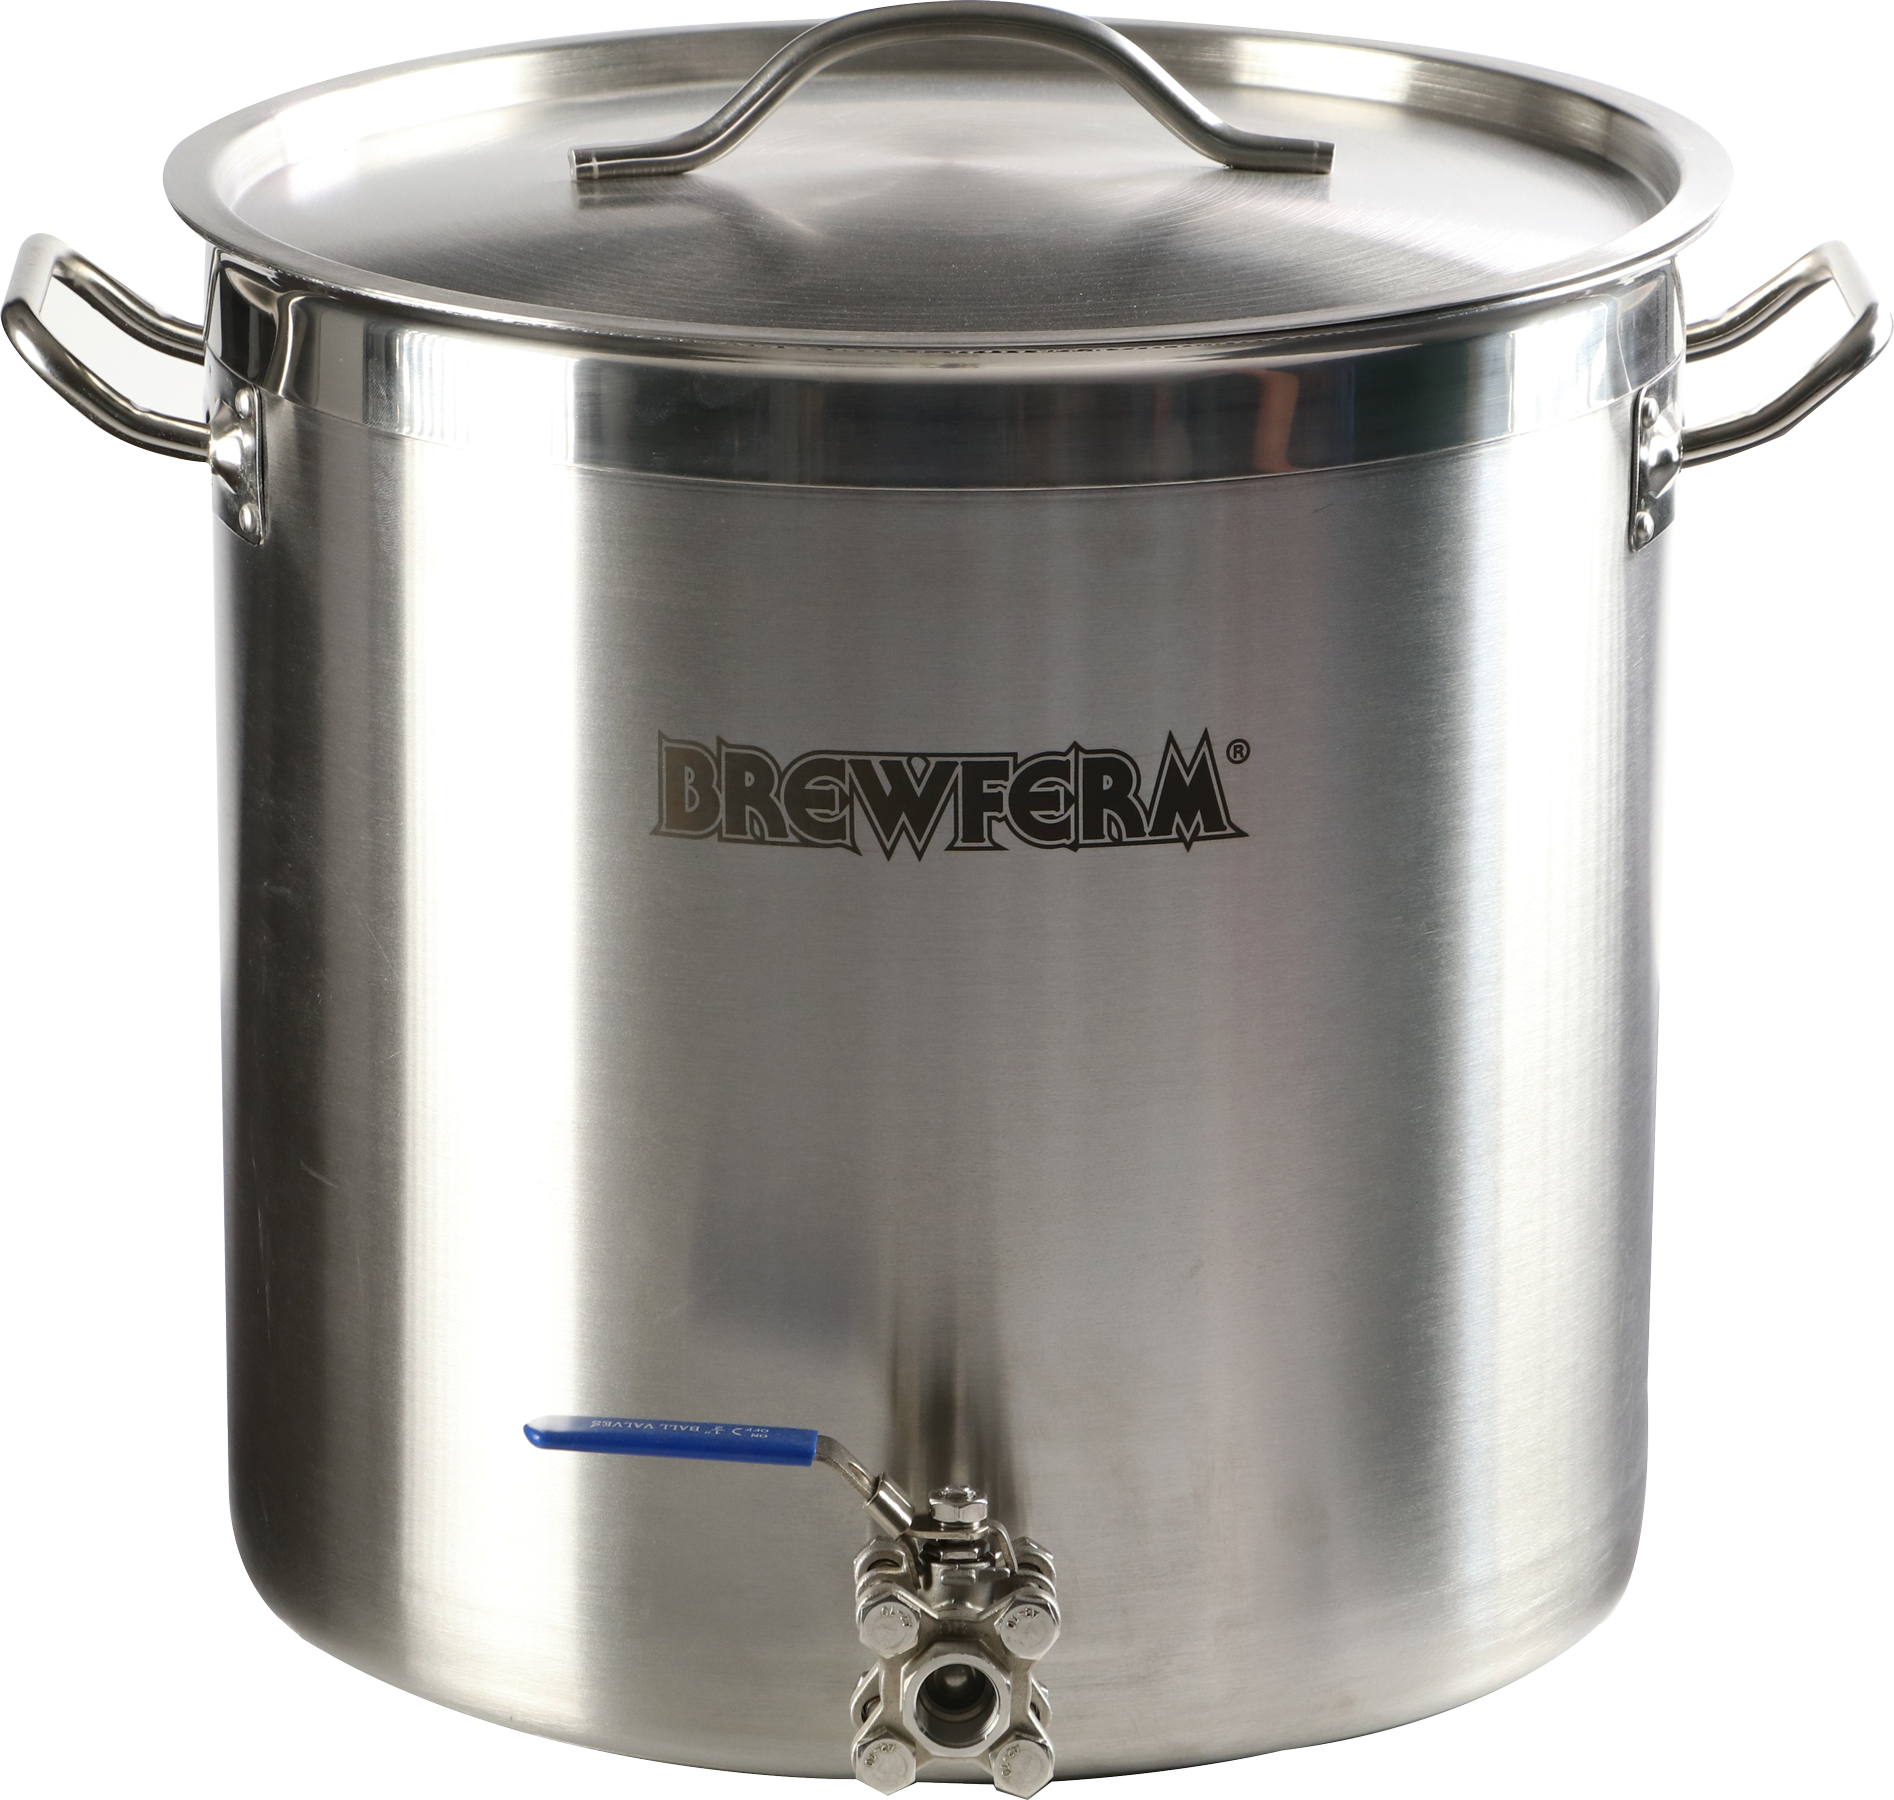 Brewferm homebrew kettle 35L with ball valve